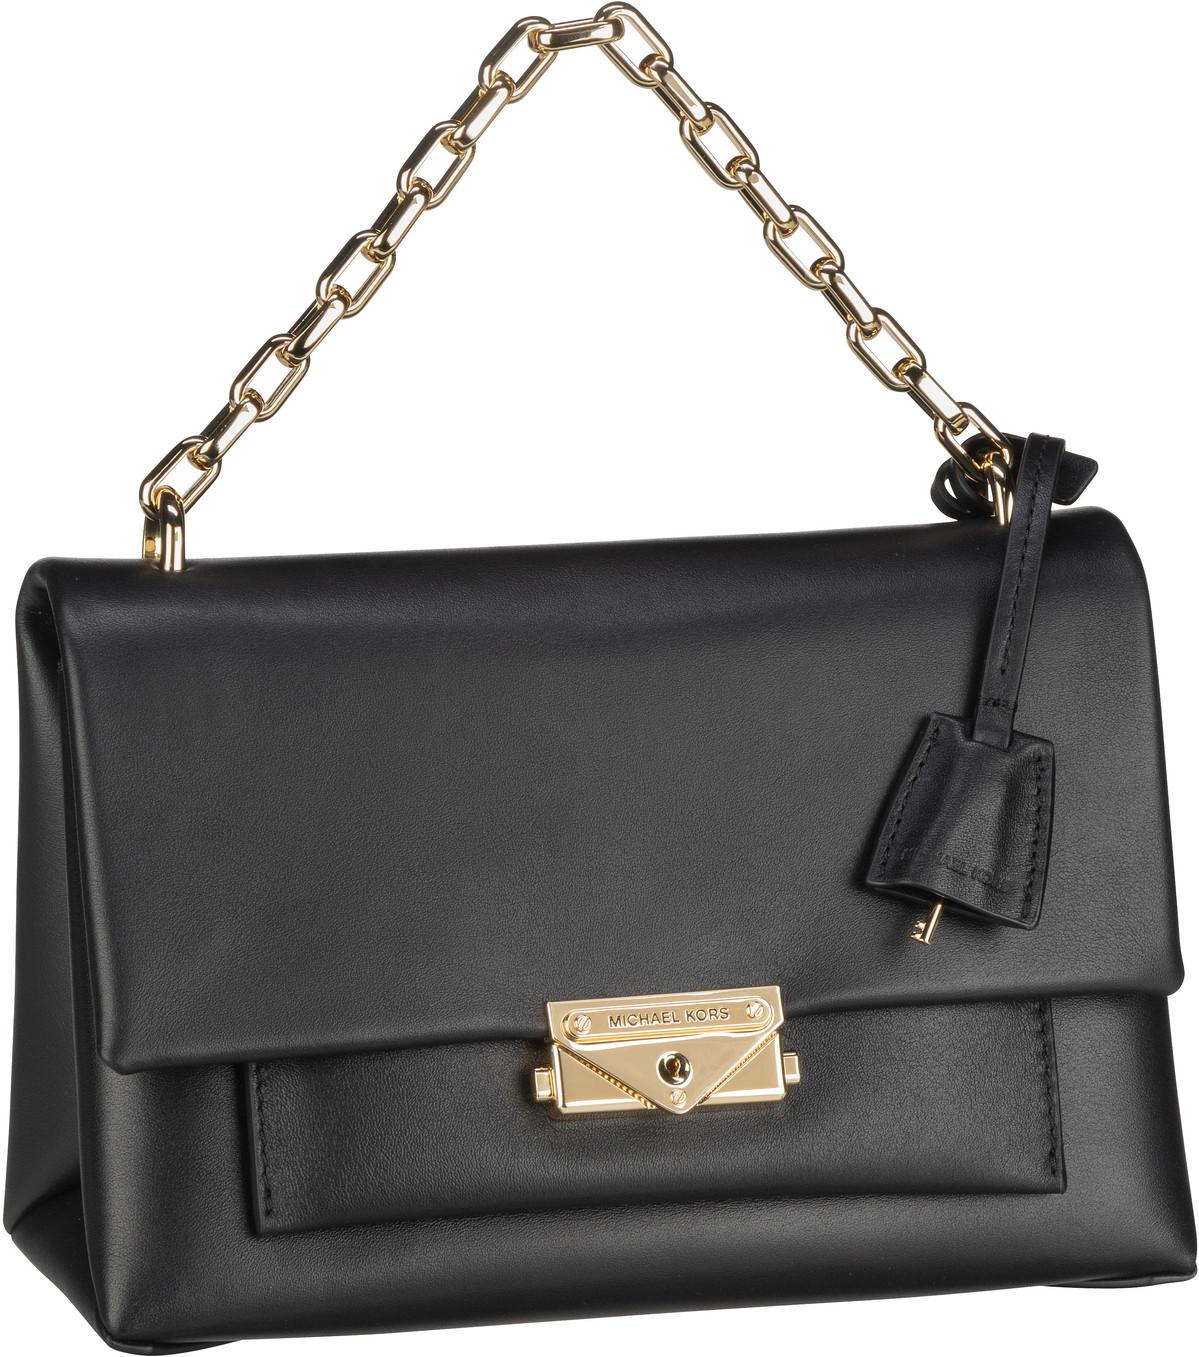 Michael Kors Handtasche Cece Medium Chain Shoulder Black